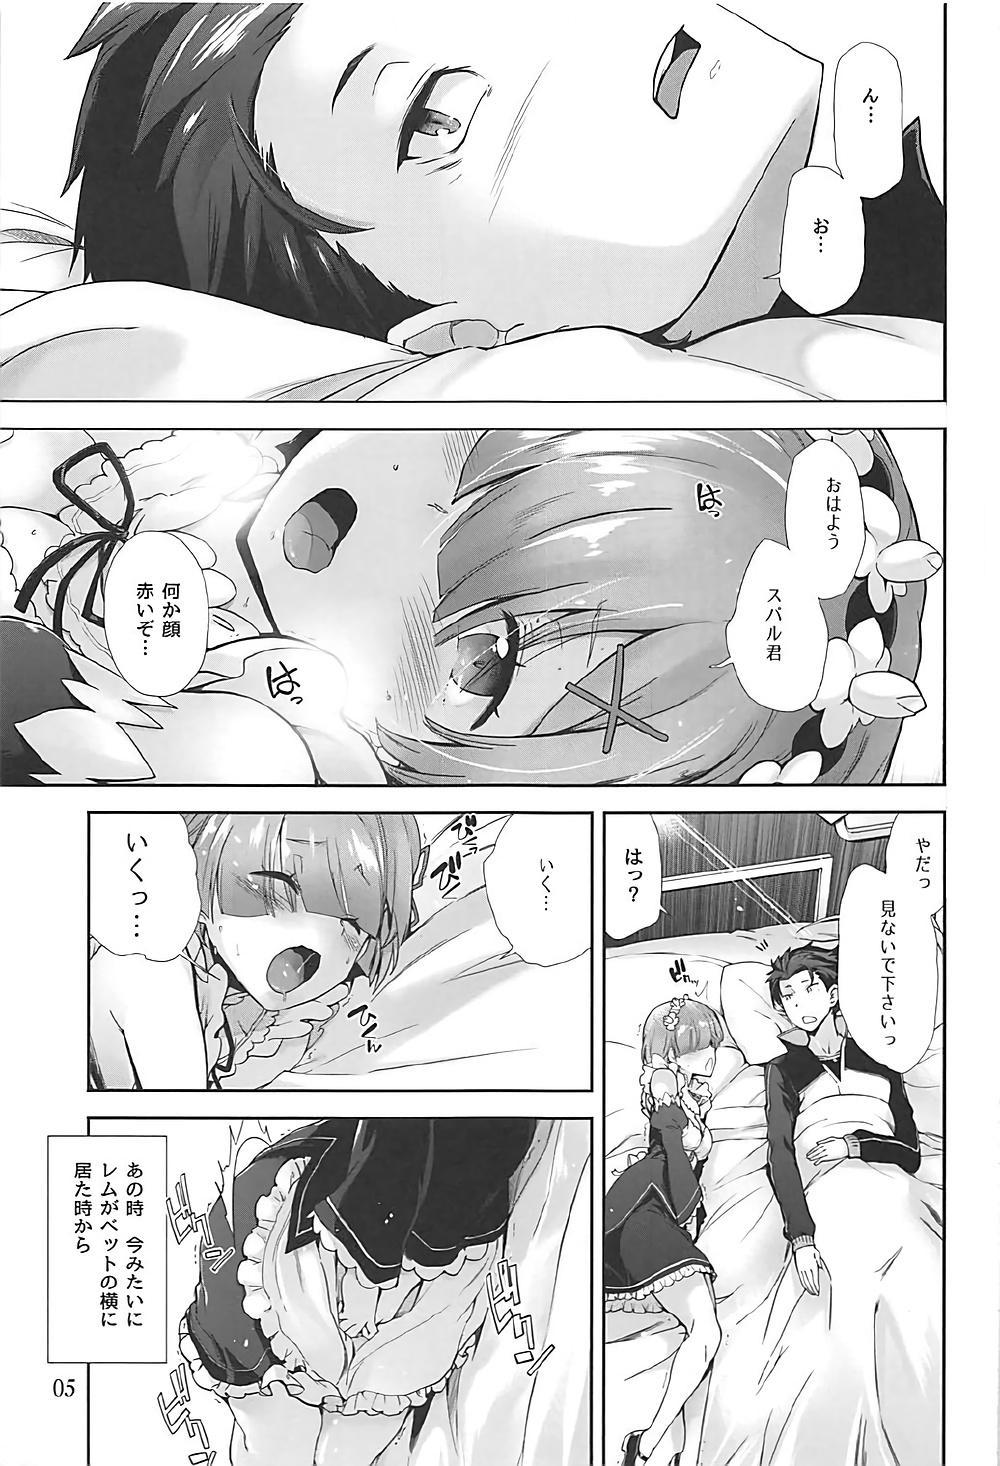 Nandome no Hajimete. 3